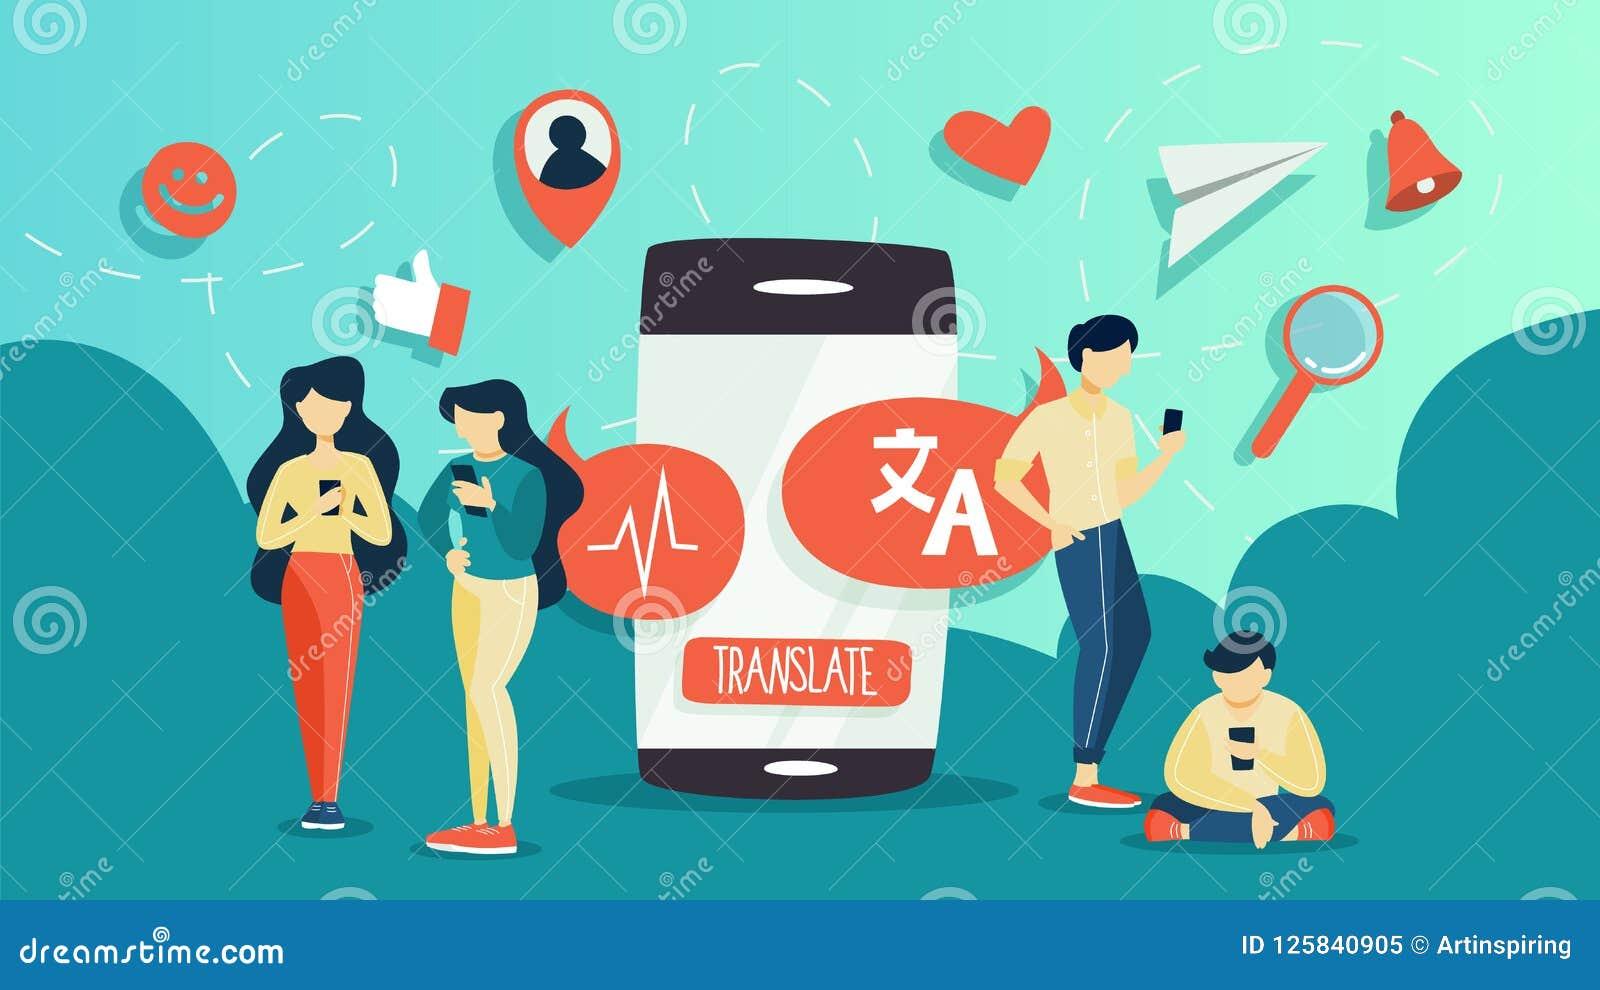 Online Translator In Mobile Phone  Translate Foreign